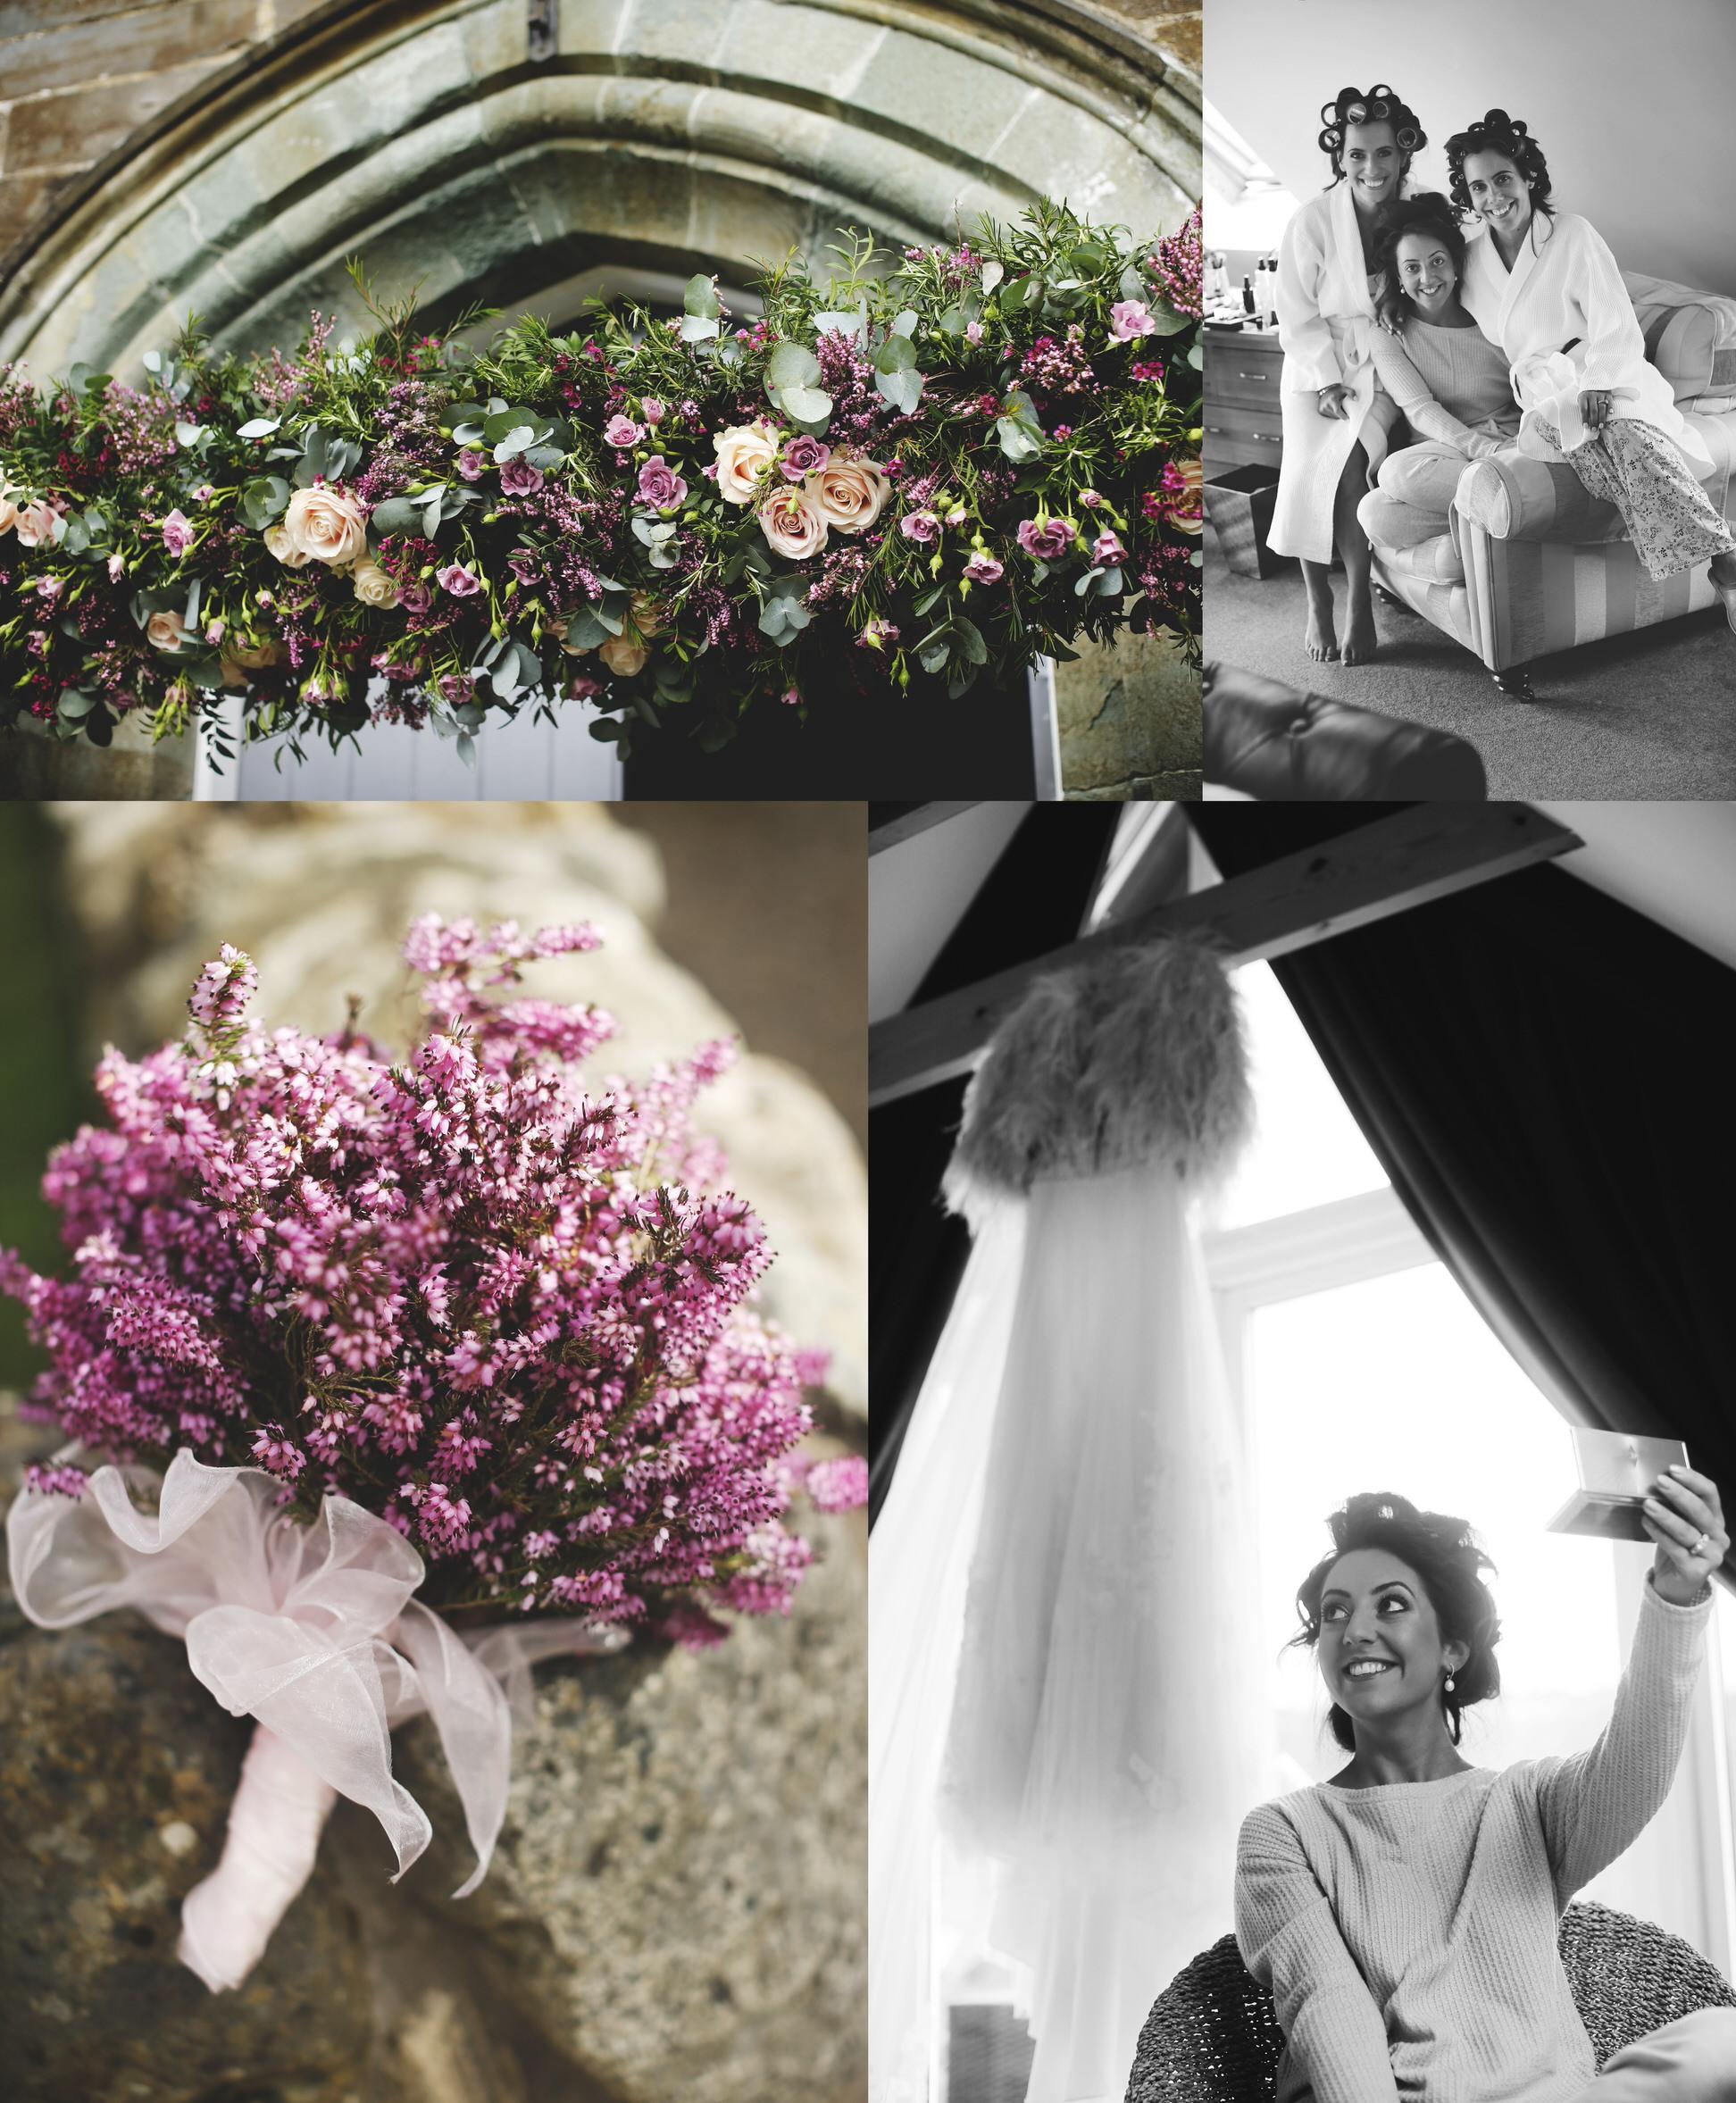 brett-harkness-cotland-wedding-photographer-highland-wedding_0003.jpg